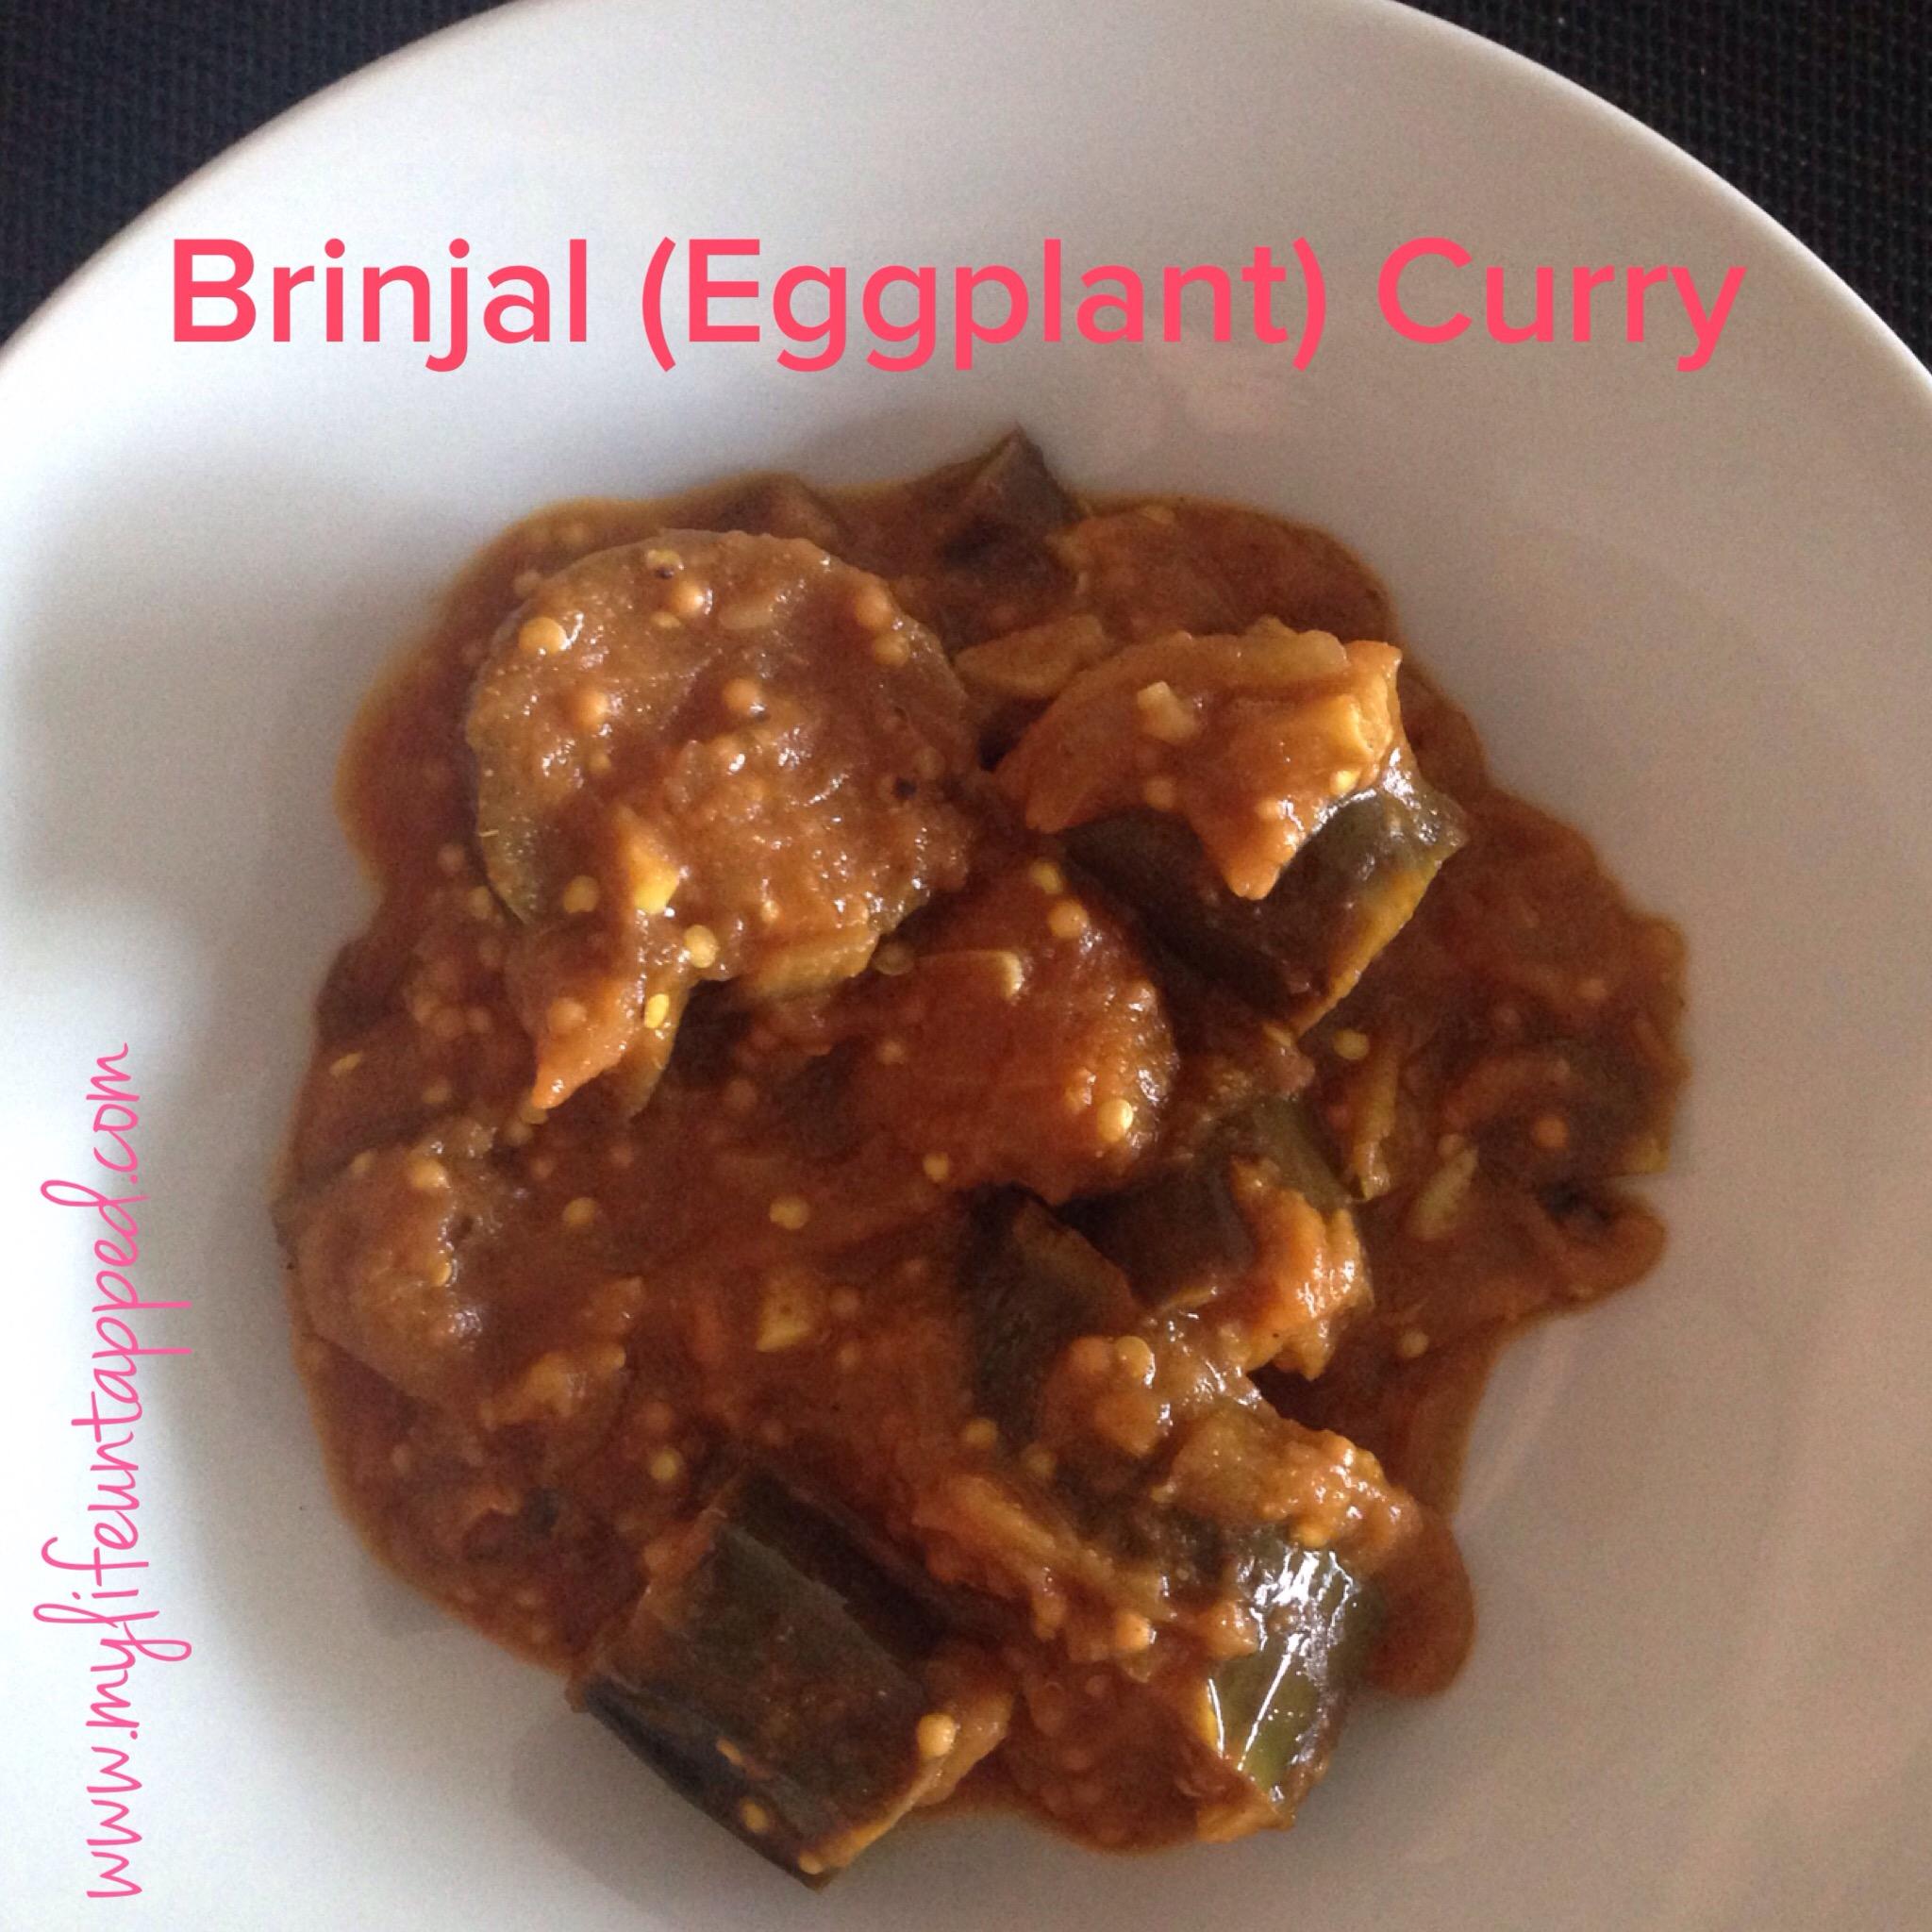 brinjal eggplant curry